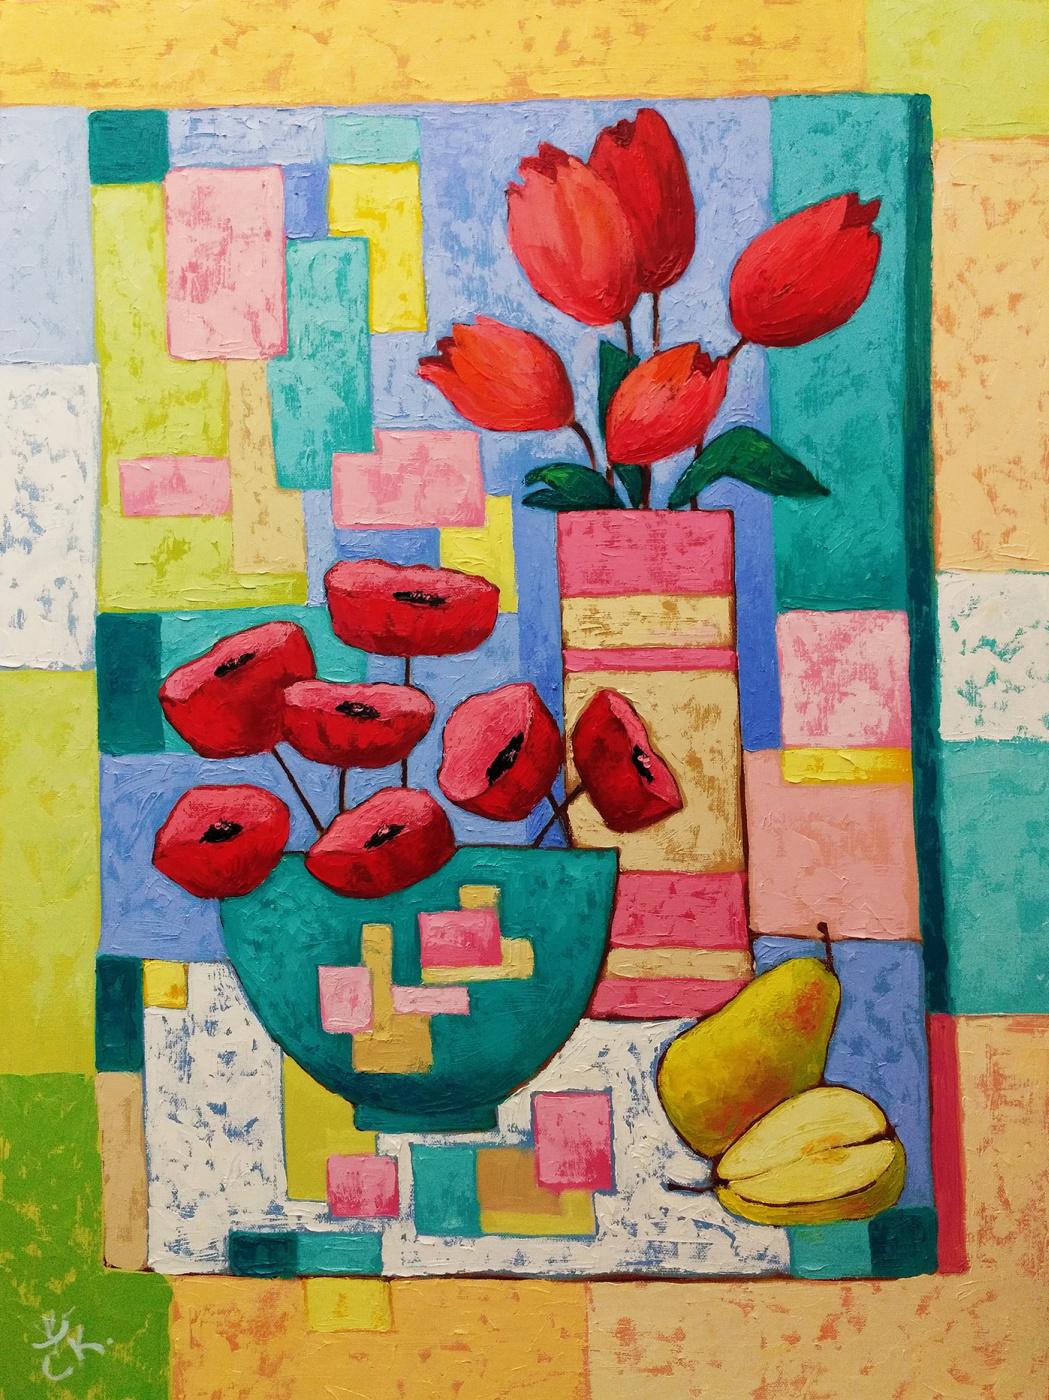 Svetlana Konstantinova. Still life with poppies and tulips